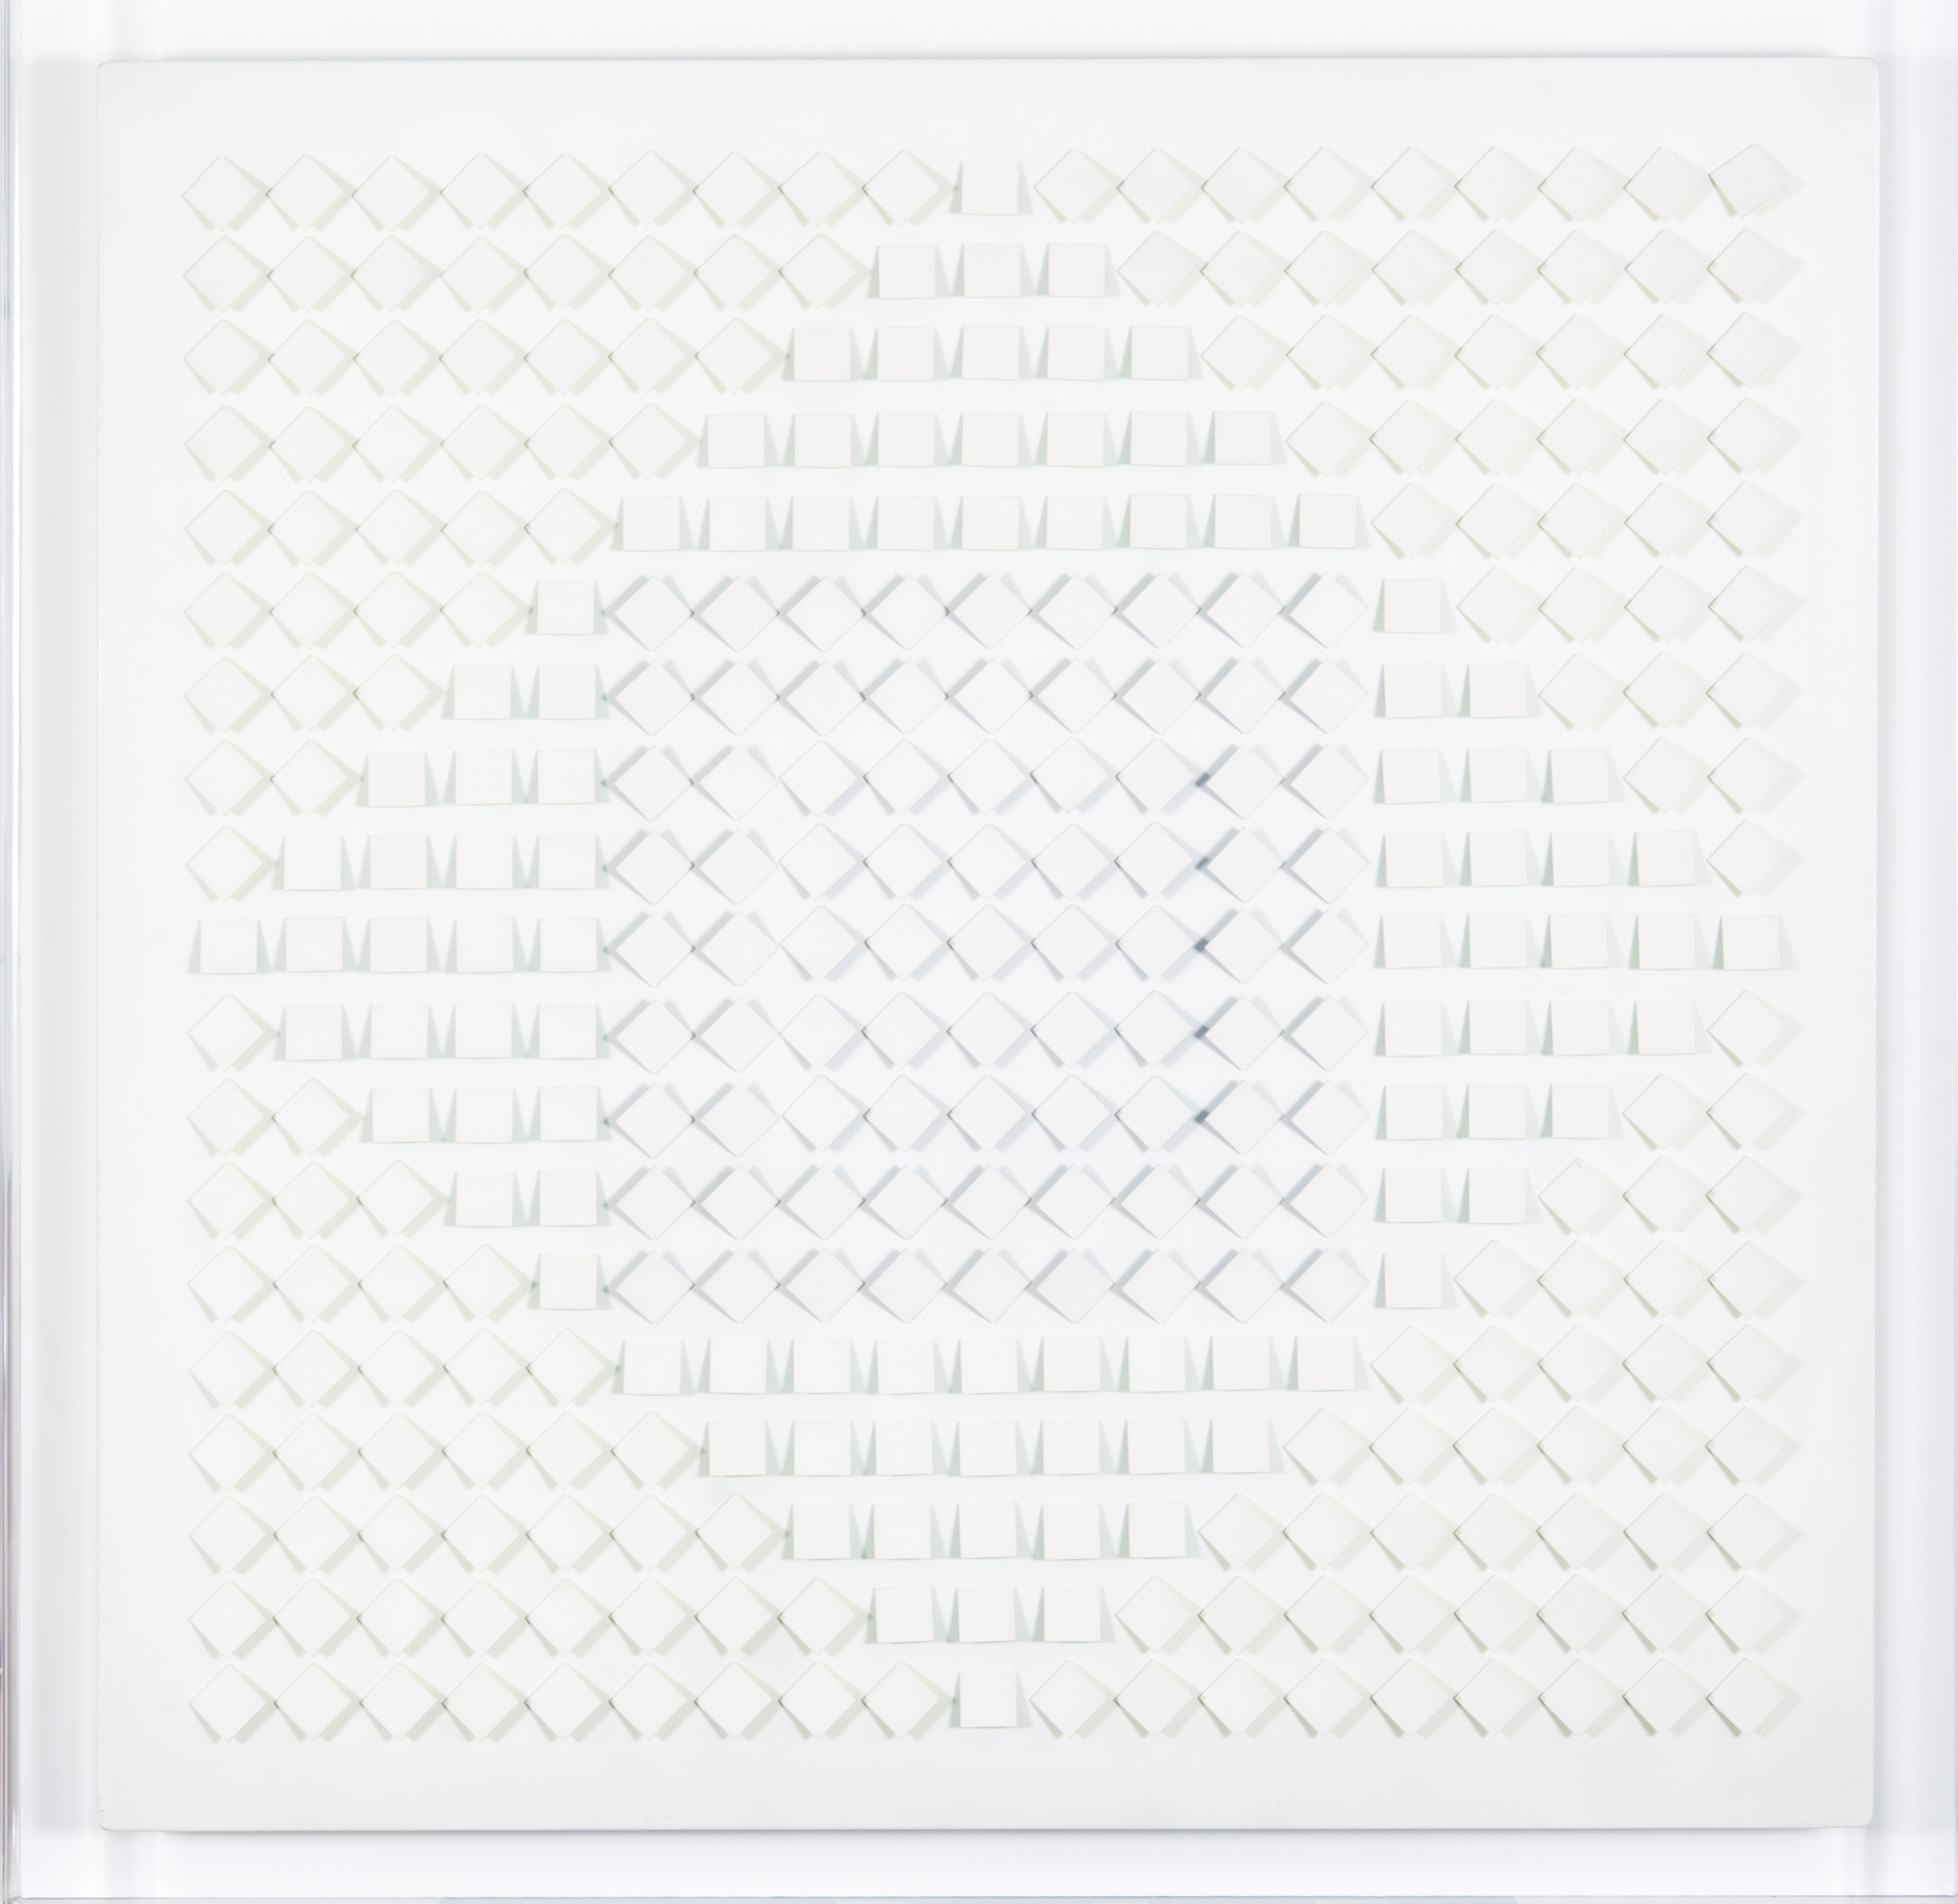 artart-collection-094-1